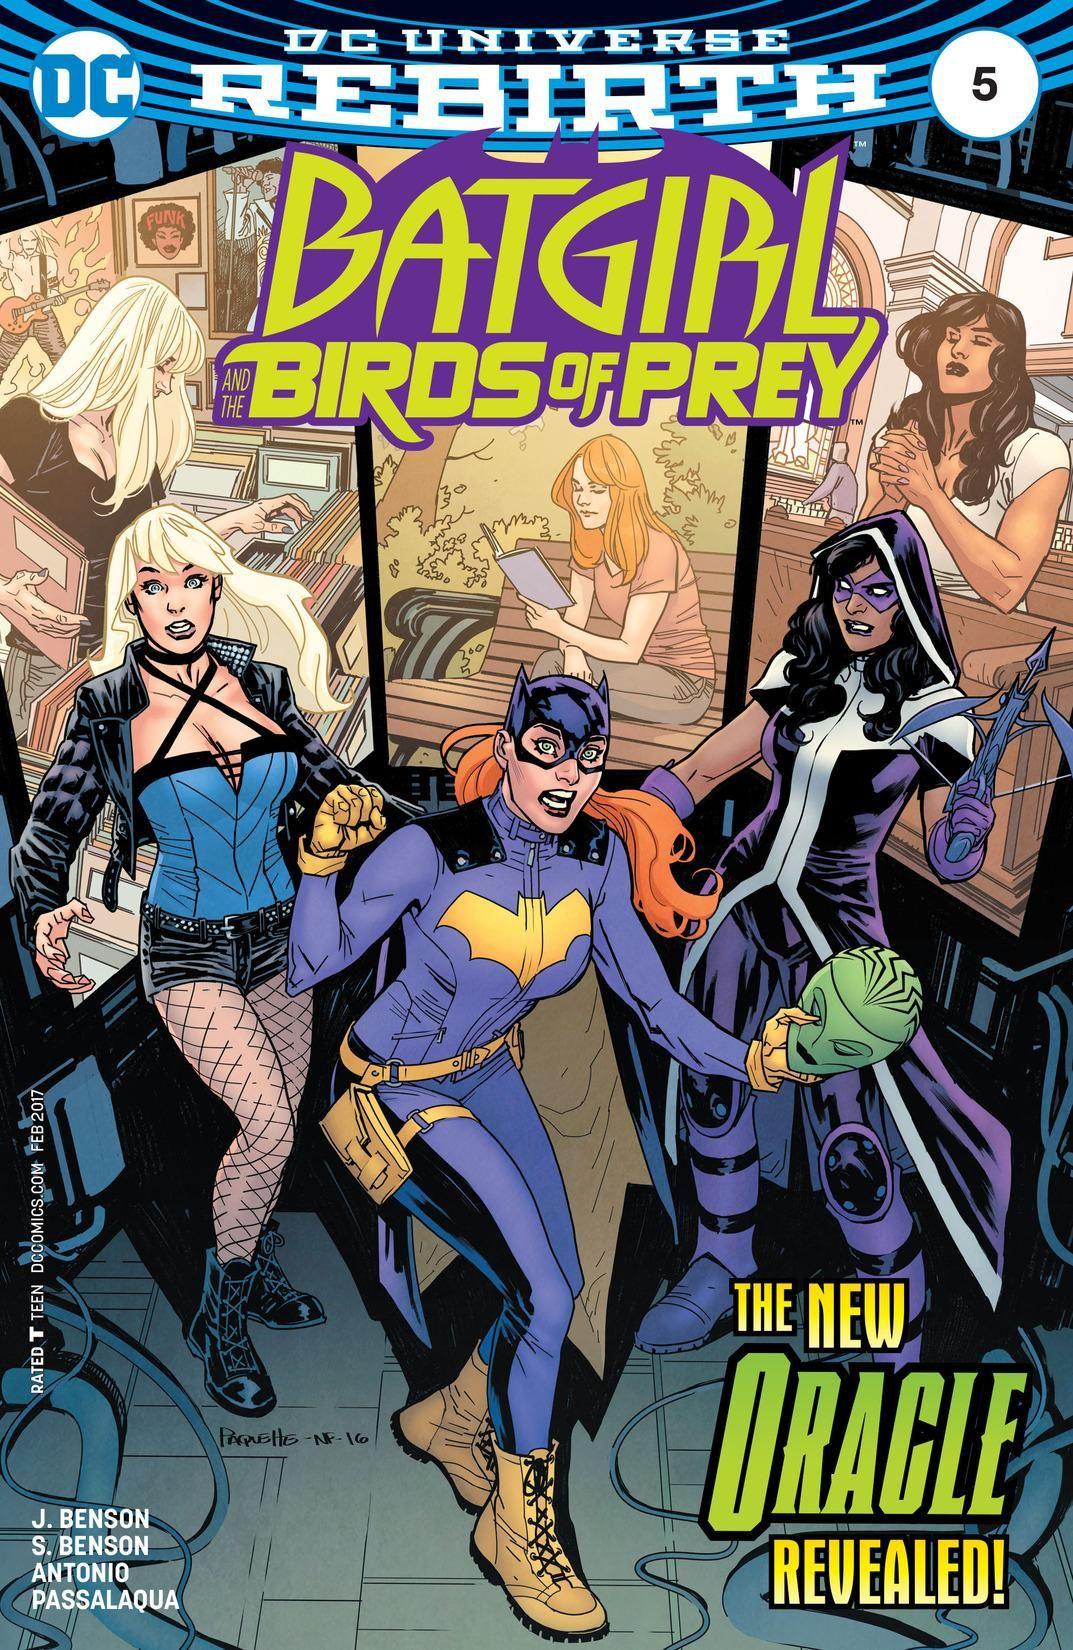 Batgirl And The Birds Of Prey Vol 1 5 Dc Database Fandom